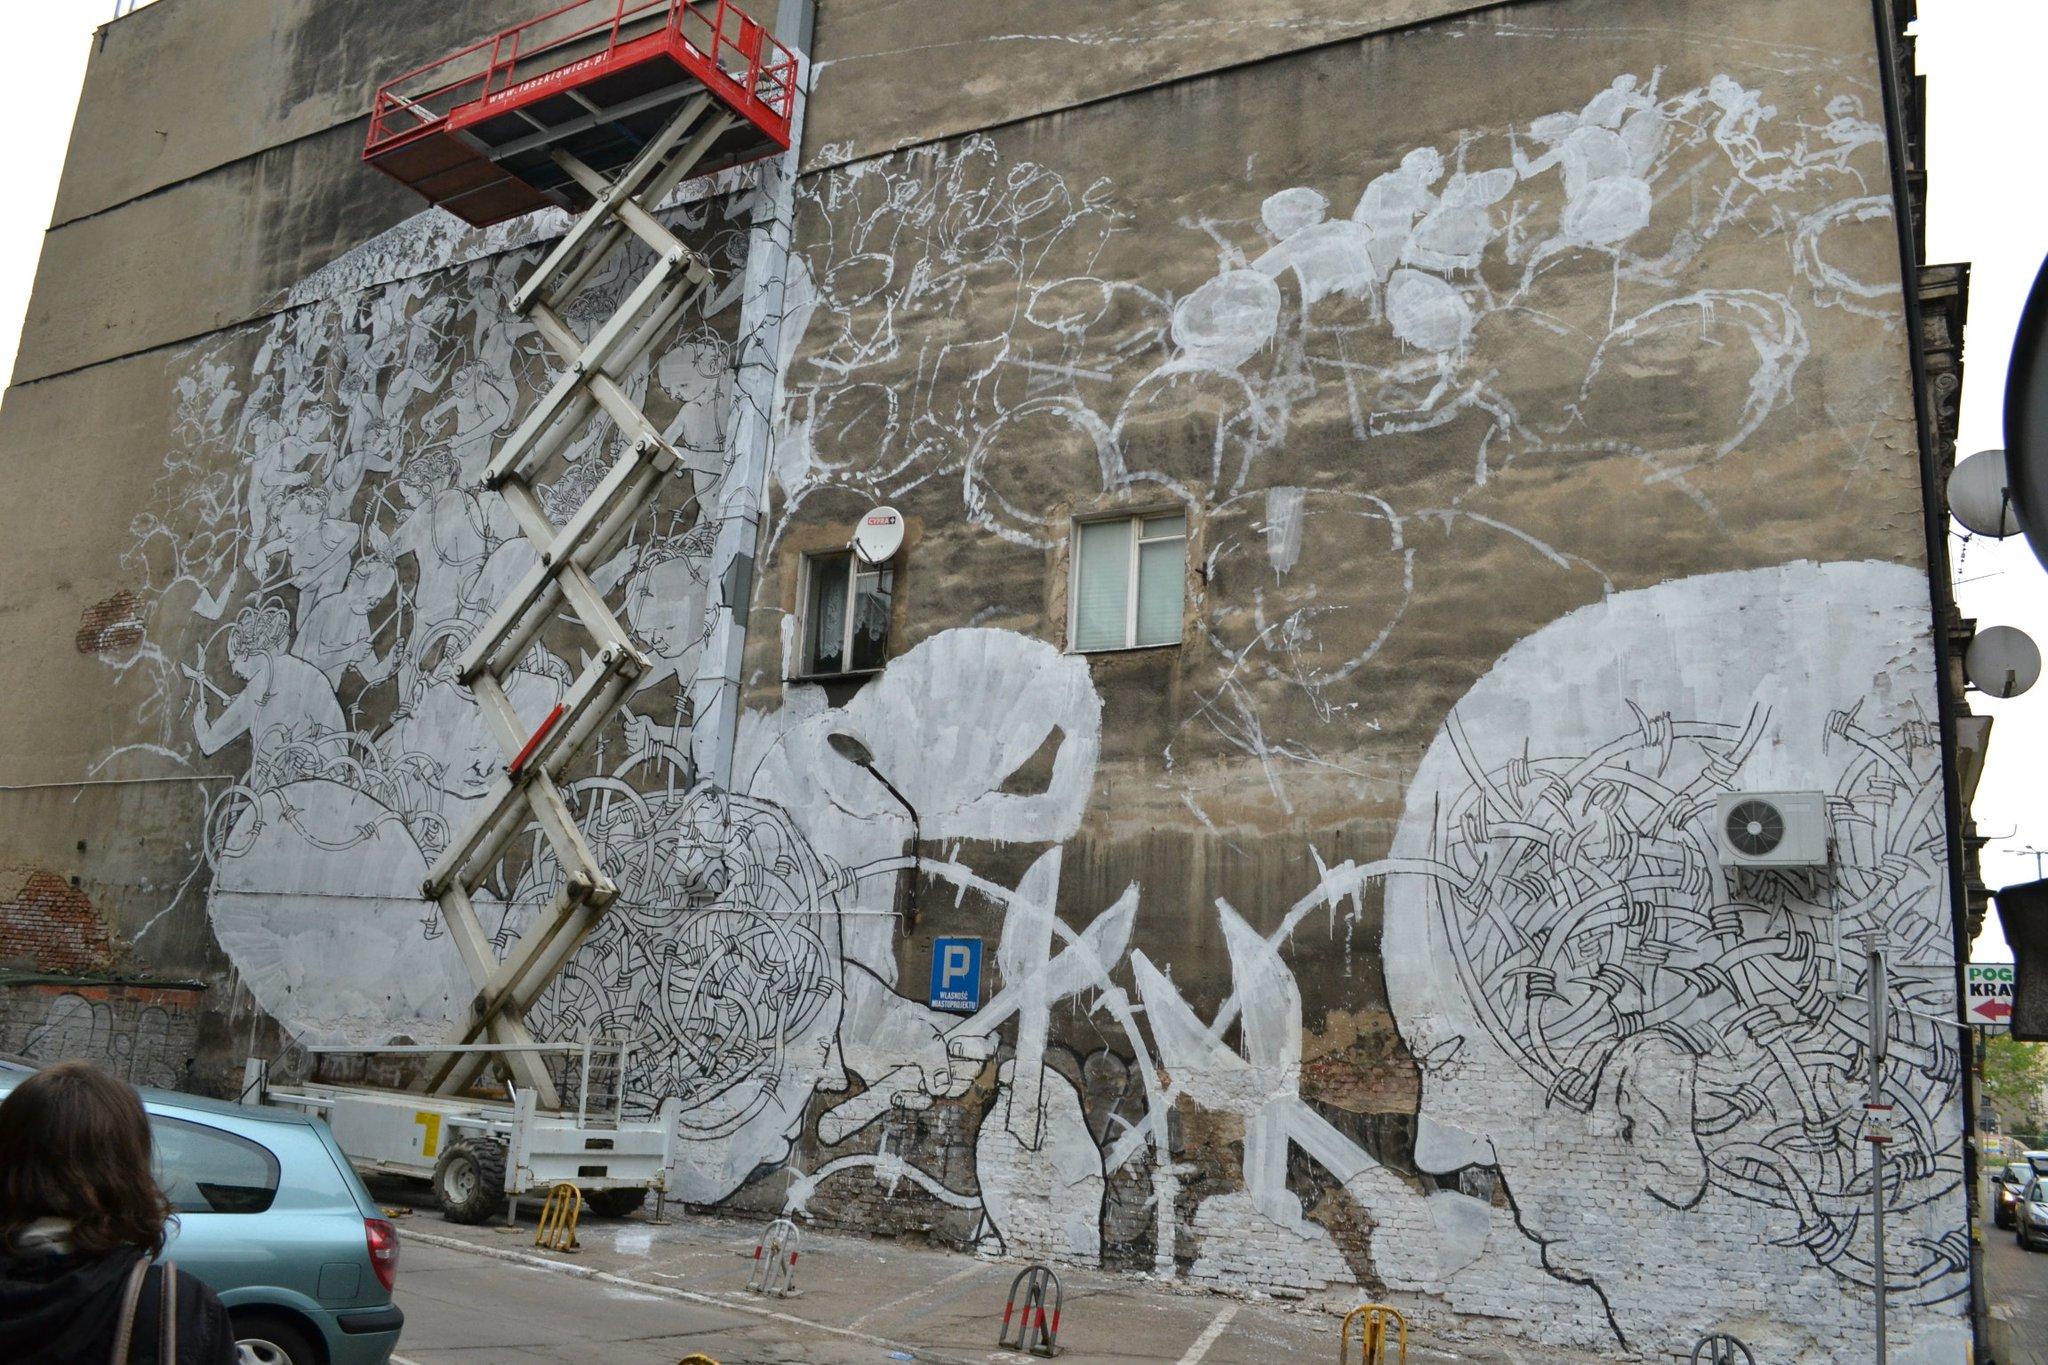 blu-grafite-italia-arte-urbana-donisio-arte (1)